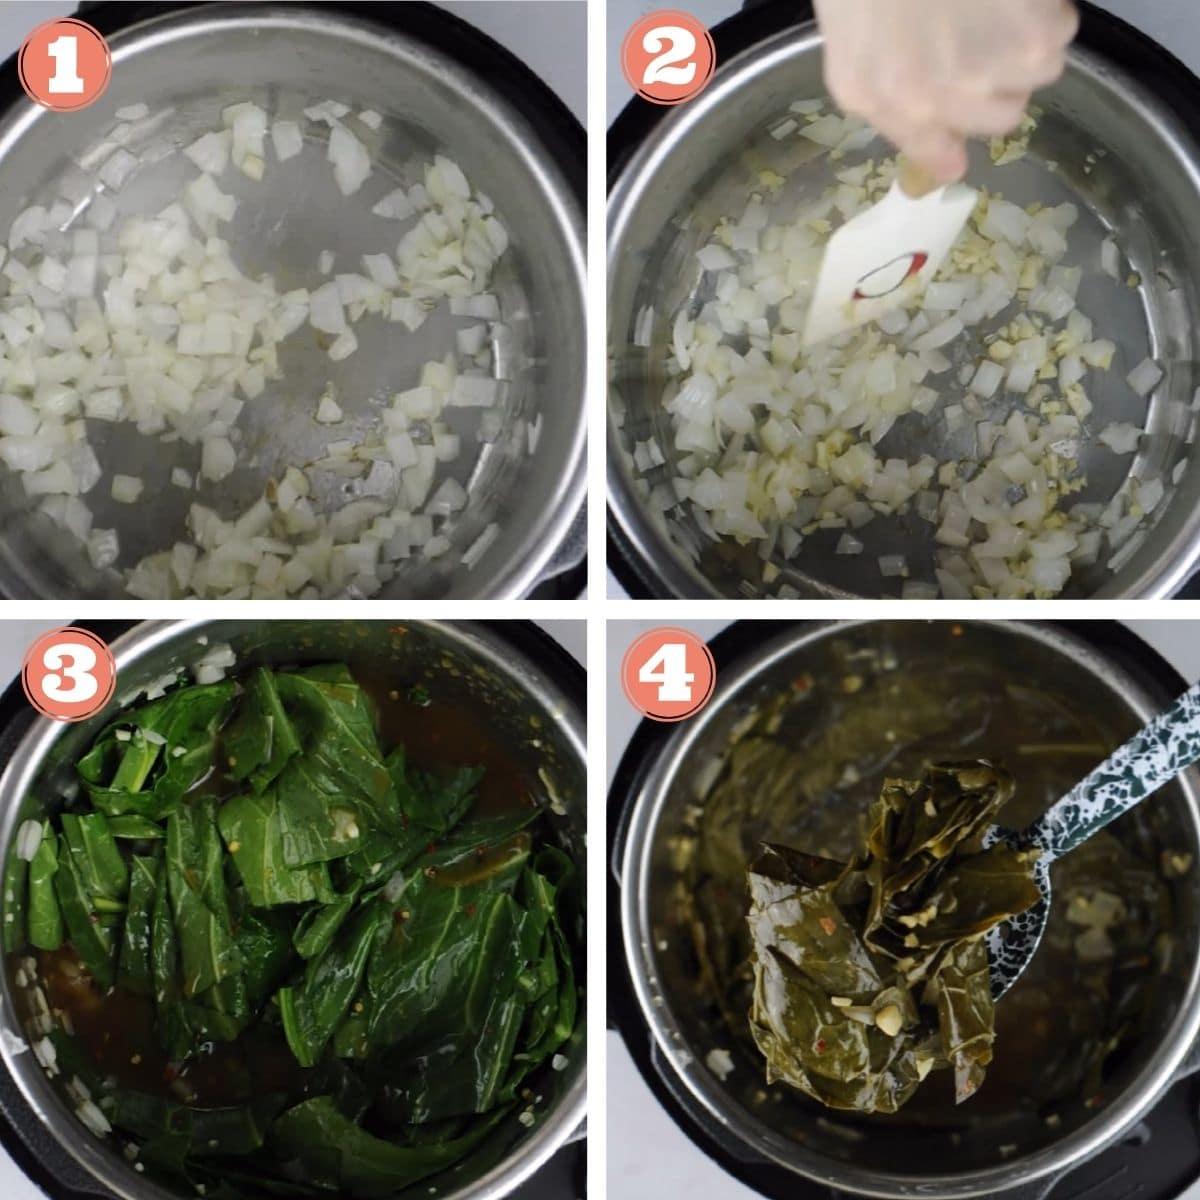 Steps 1 through 4 to make collard greens